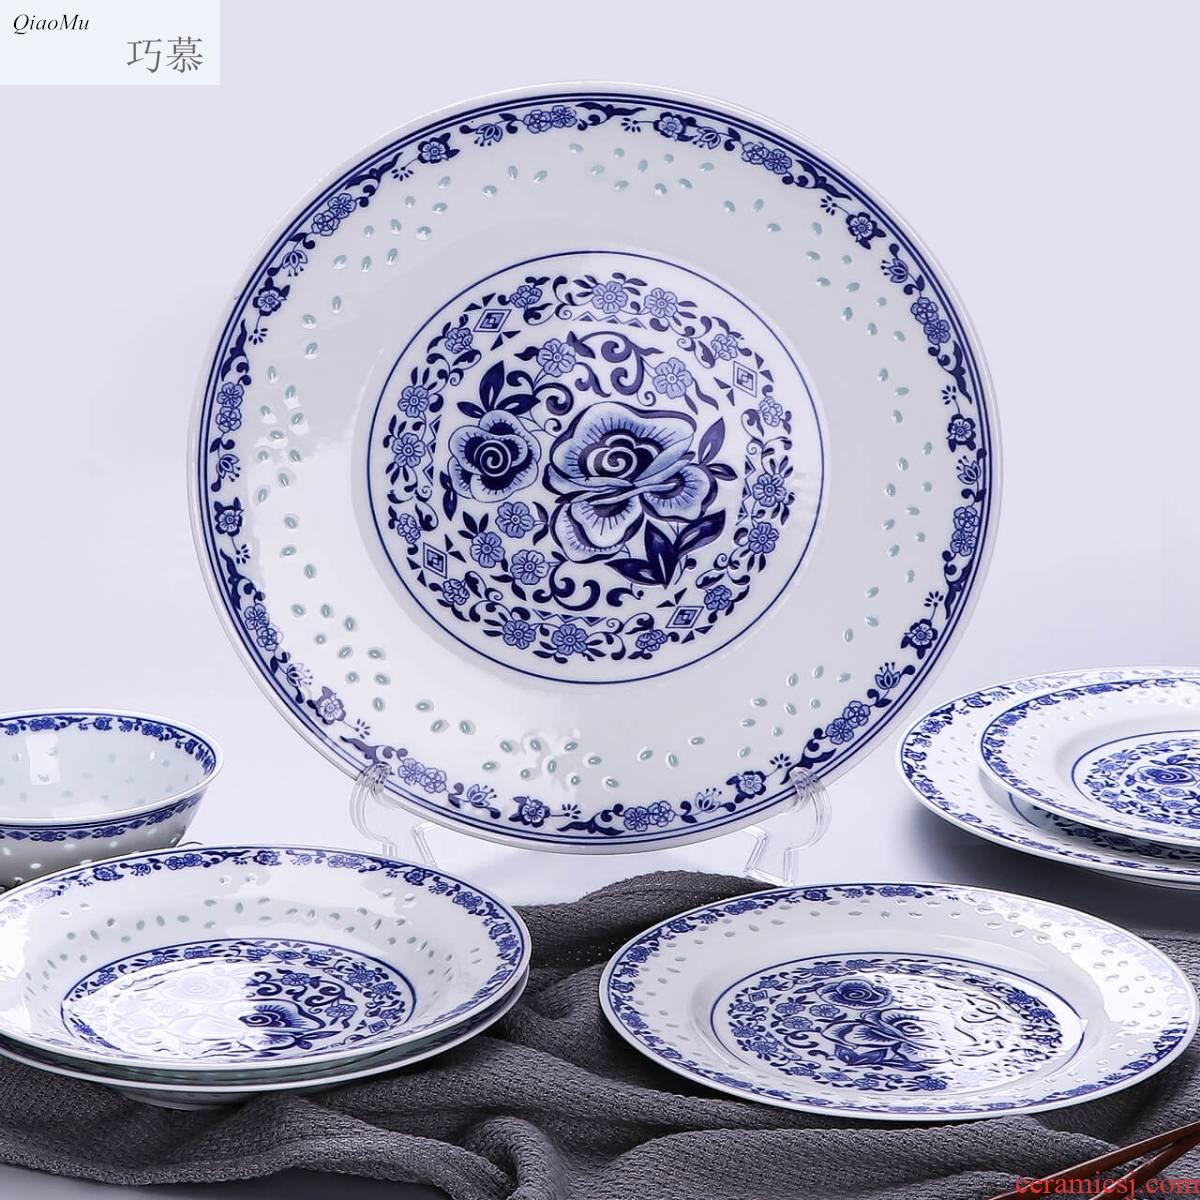 Qiao mu jingdezhen porcelain and ceramic dish dish dish 8 inches large capacity MeiYing soup dish plates